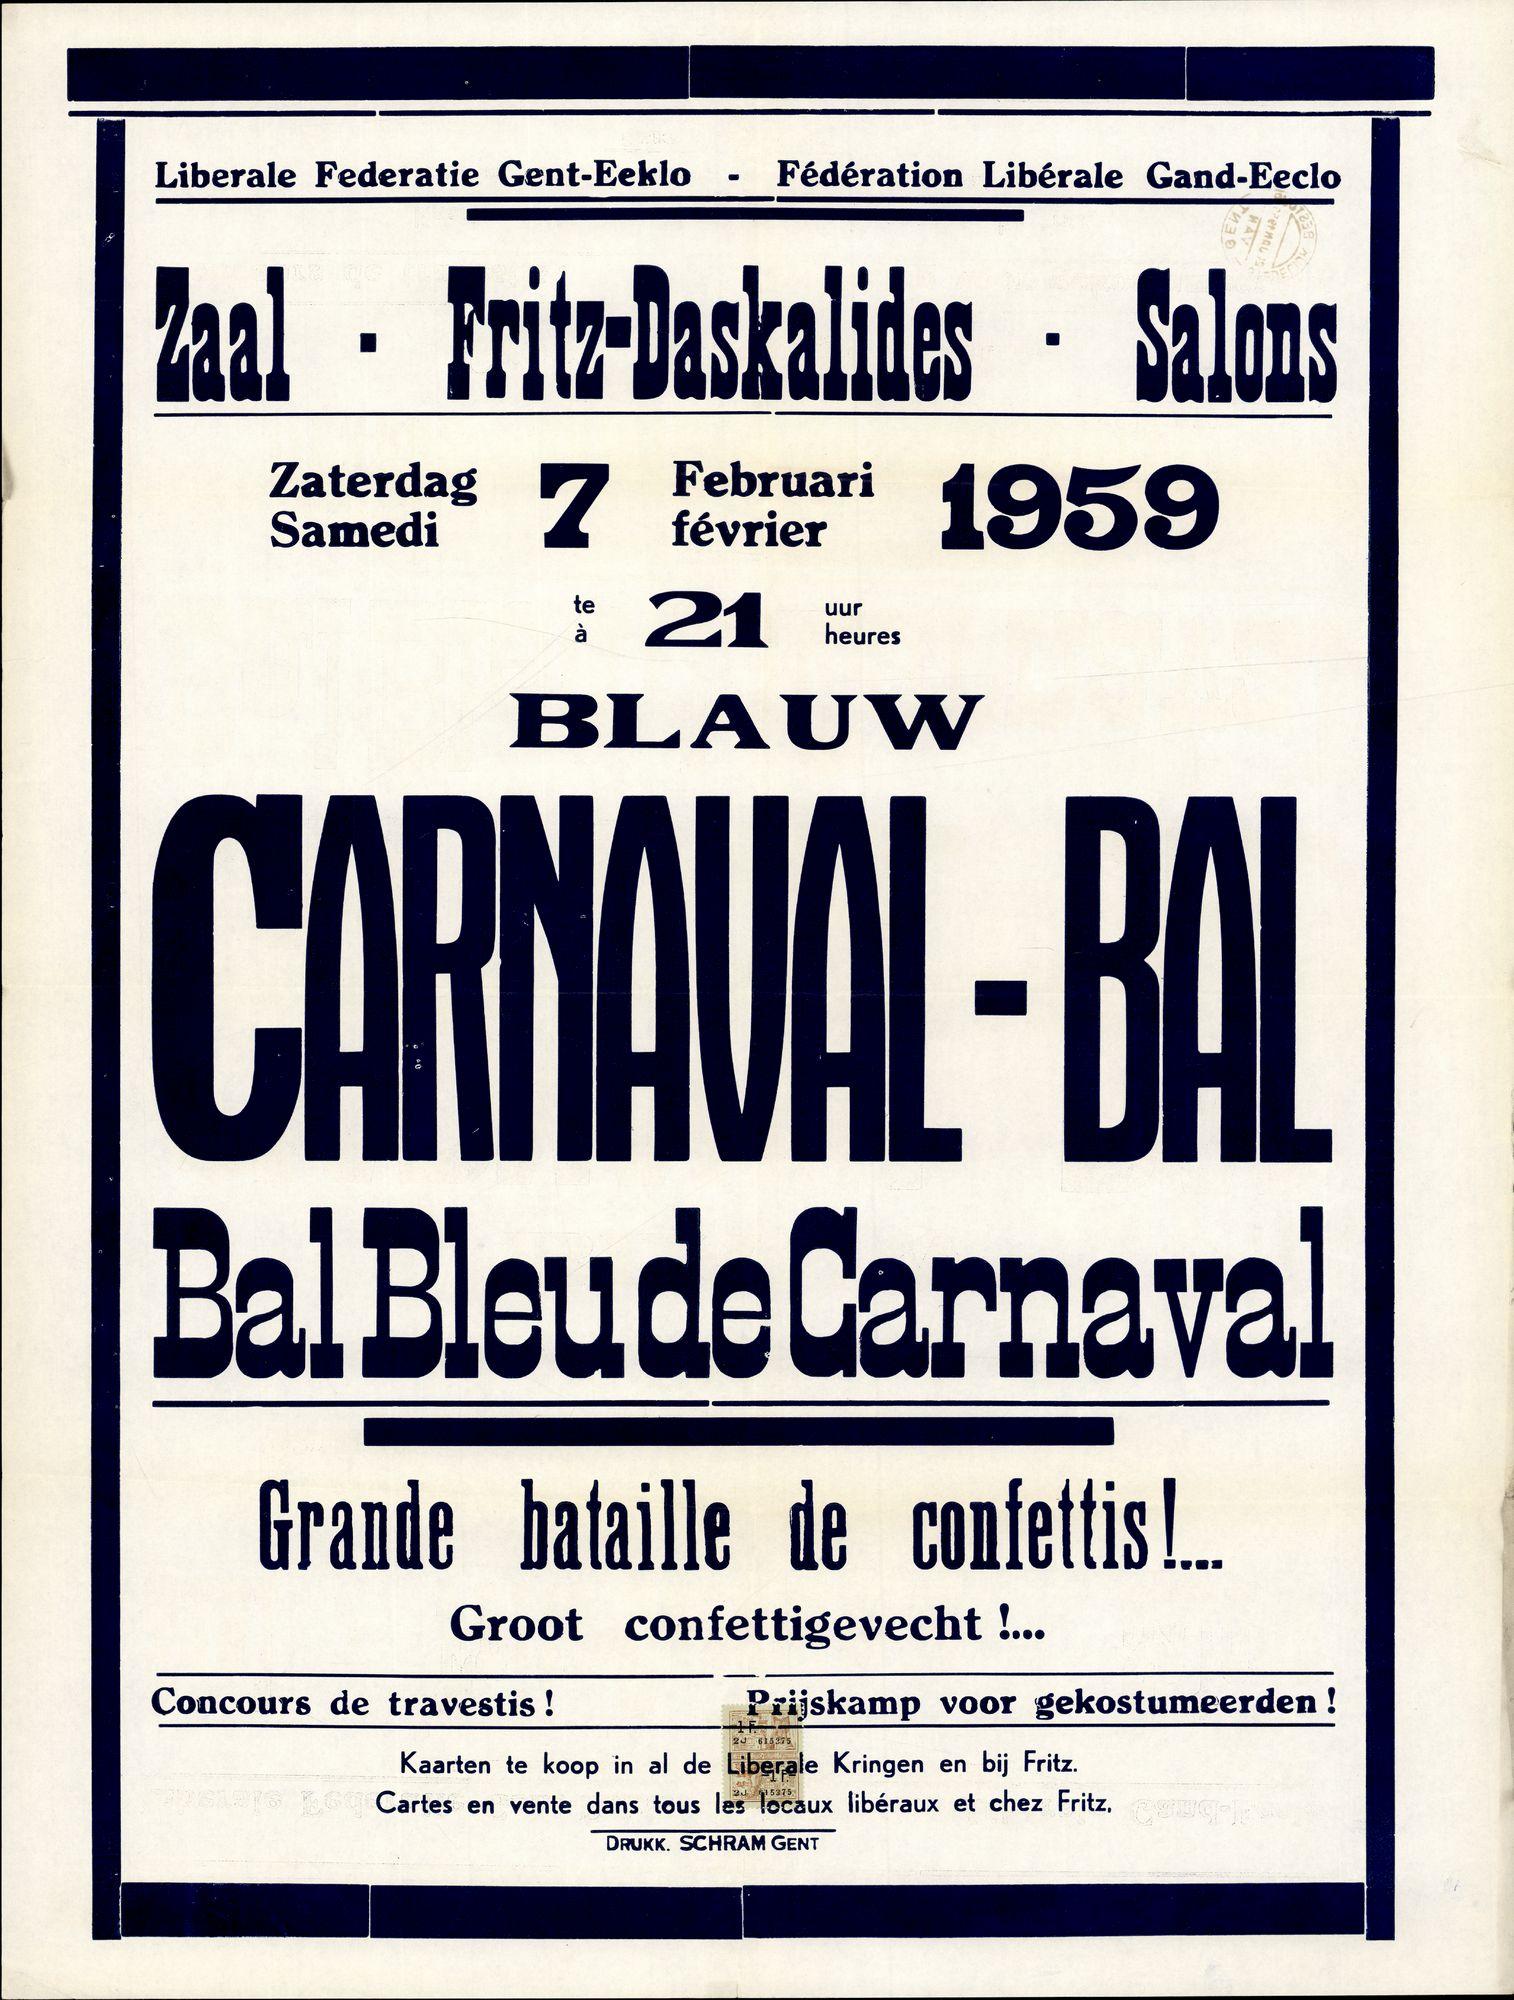 Blauw Carnaval - Bal, Bal Bleude Carnaval | Zaal - Fritz-Daskalides - Salons, zaterdag - samedi 7 februari - février 1959 te - à 21 uur / heurses